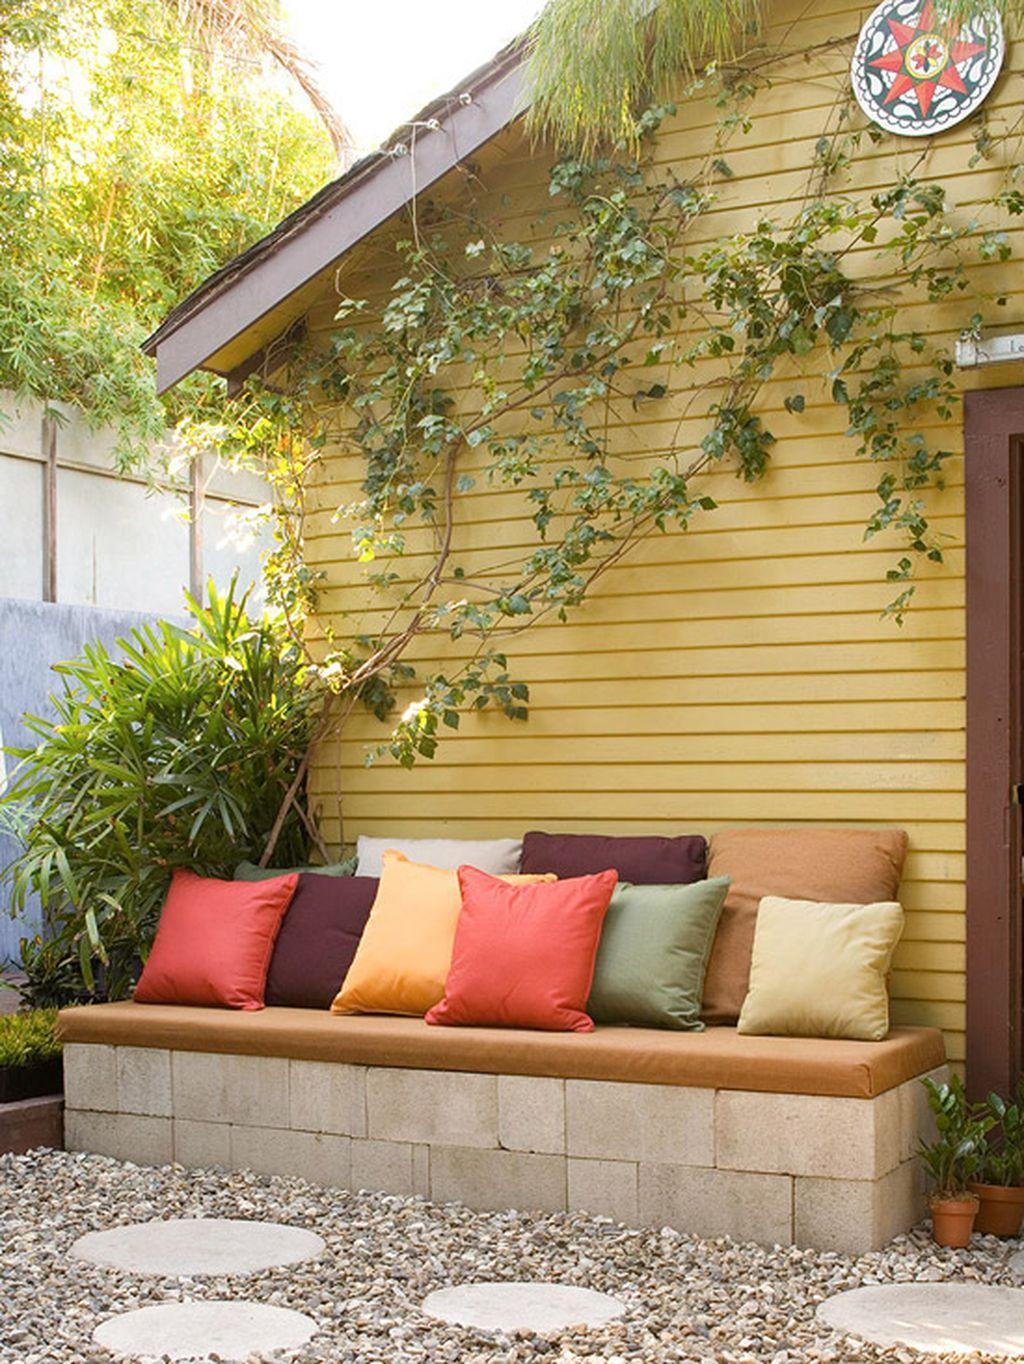 63 Creative Cinder Block Backyard Ideas on a Budget | Cinder, Garden ...